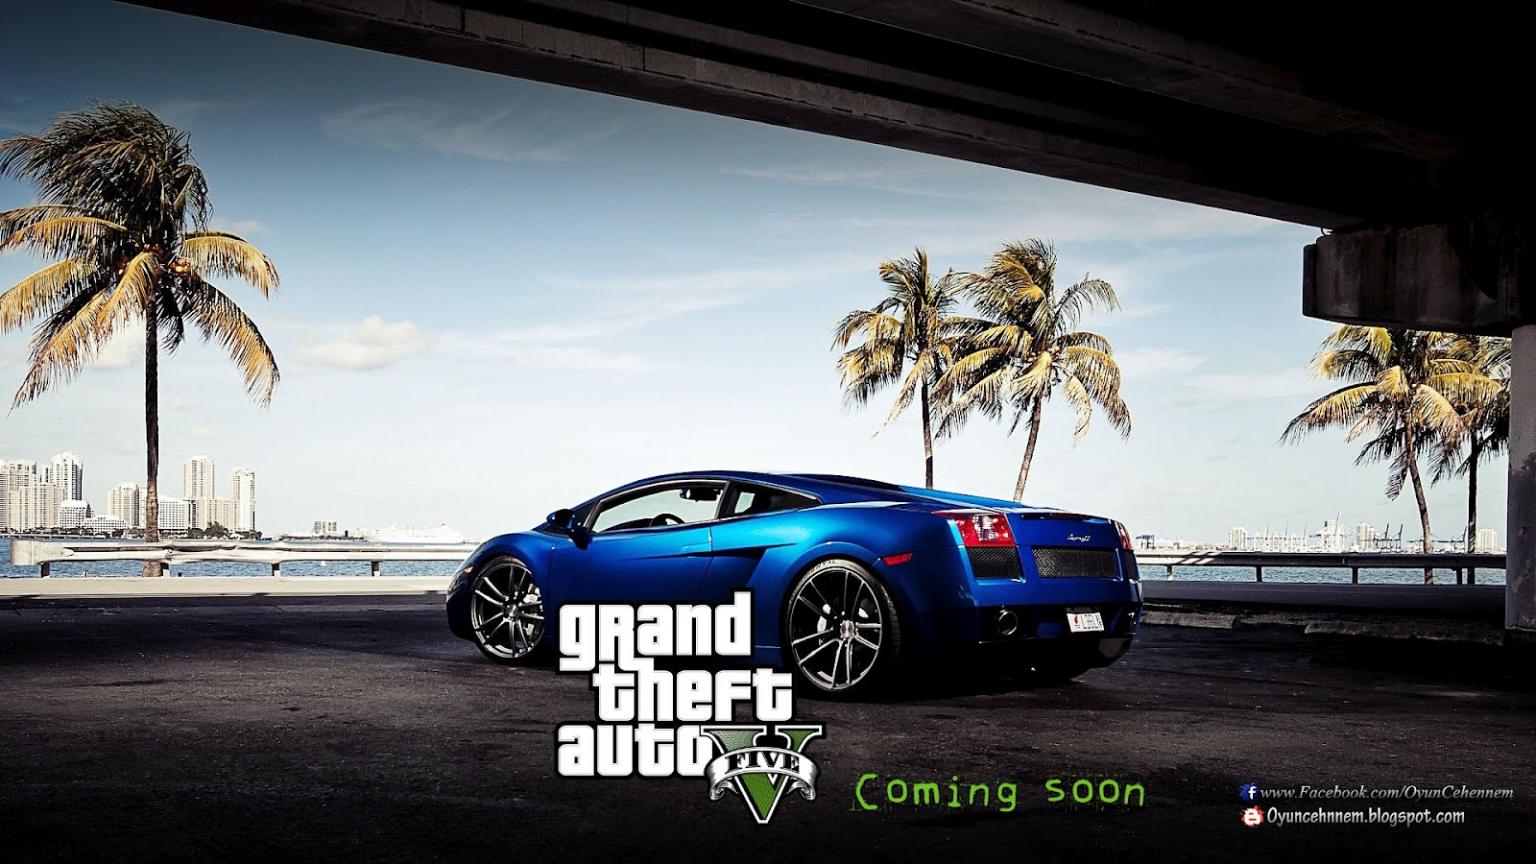 Free Download Gta 5 Hd Wallpapers Gta5 Gta V Grand Theft